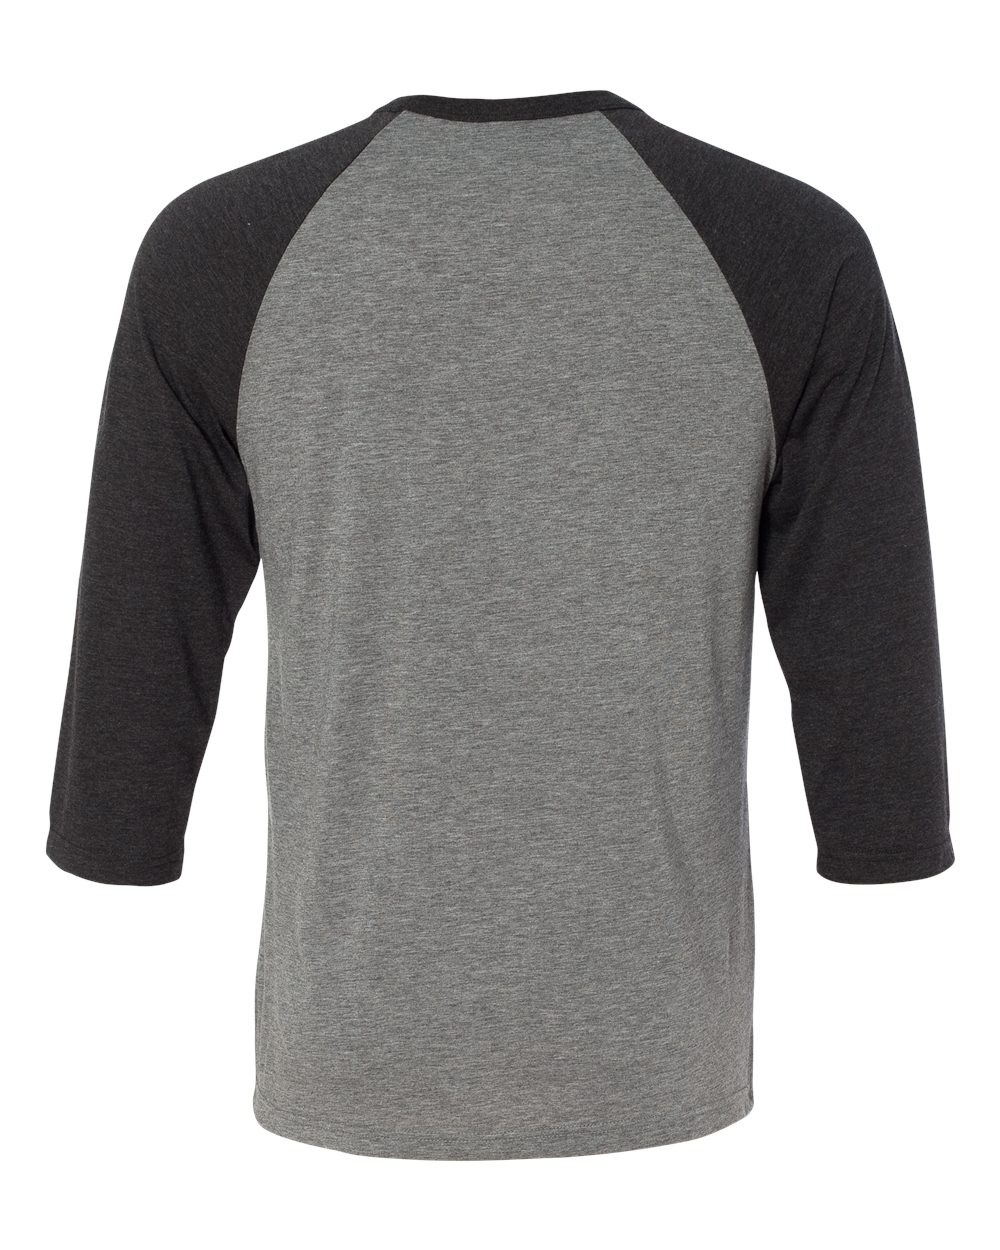 Plain Black T Shirt Back View